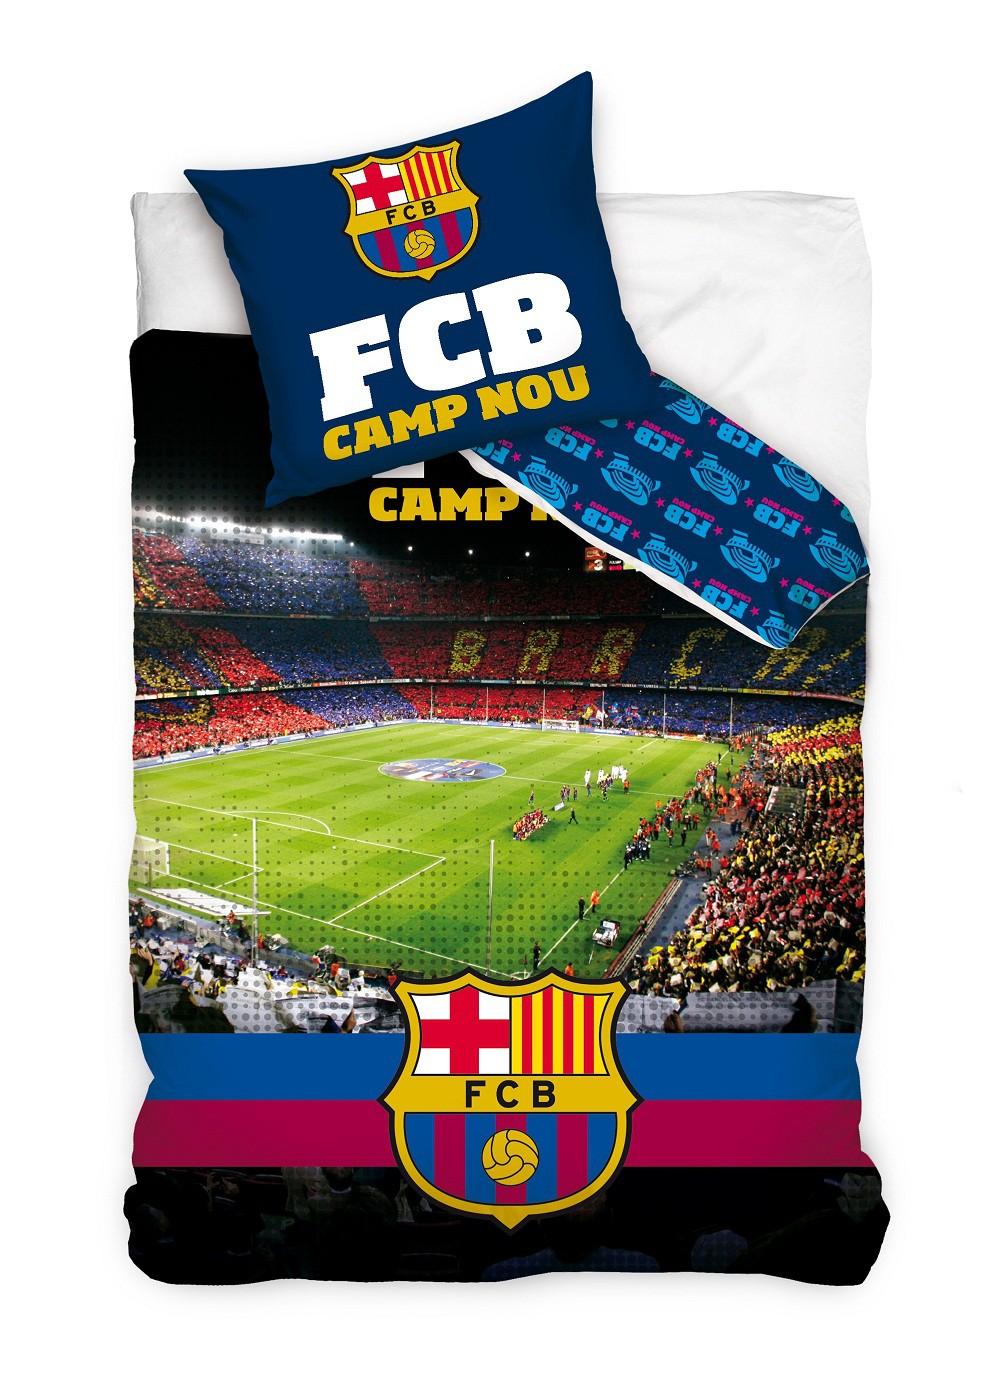 FC BARCELONA DUVET SET CAMP NOU 140X200